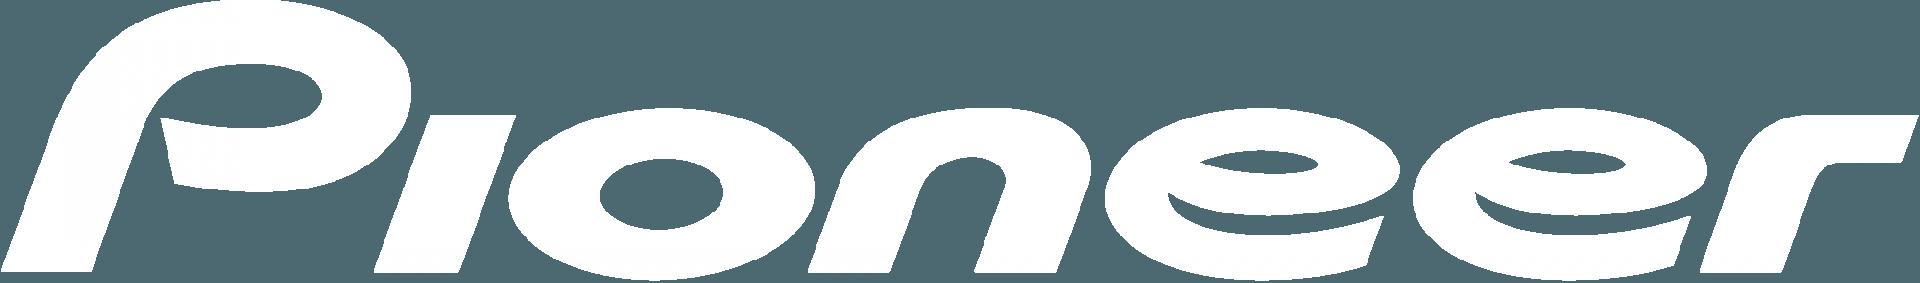 Pioneer logo white